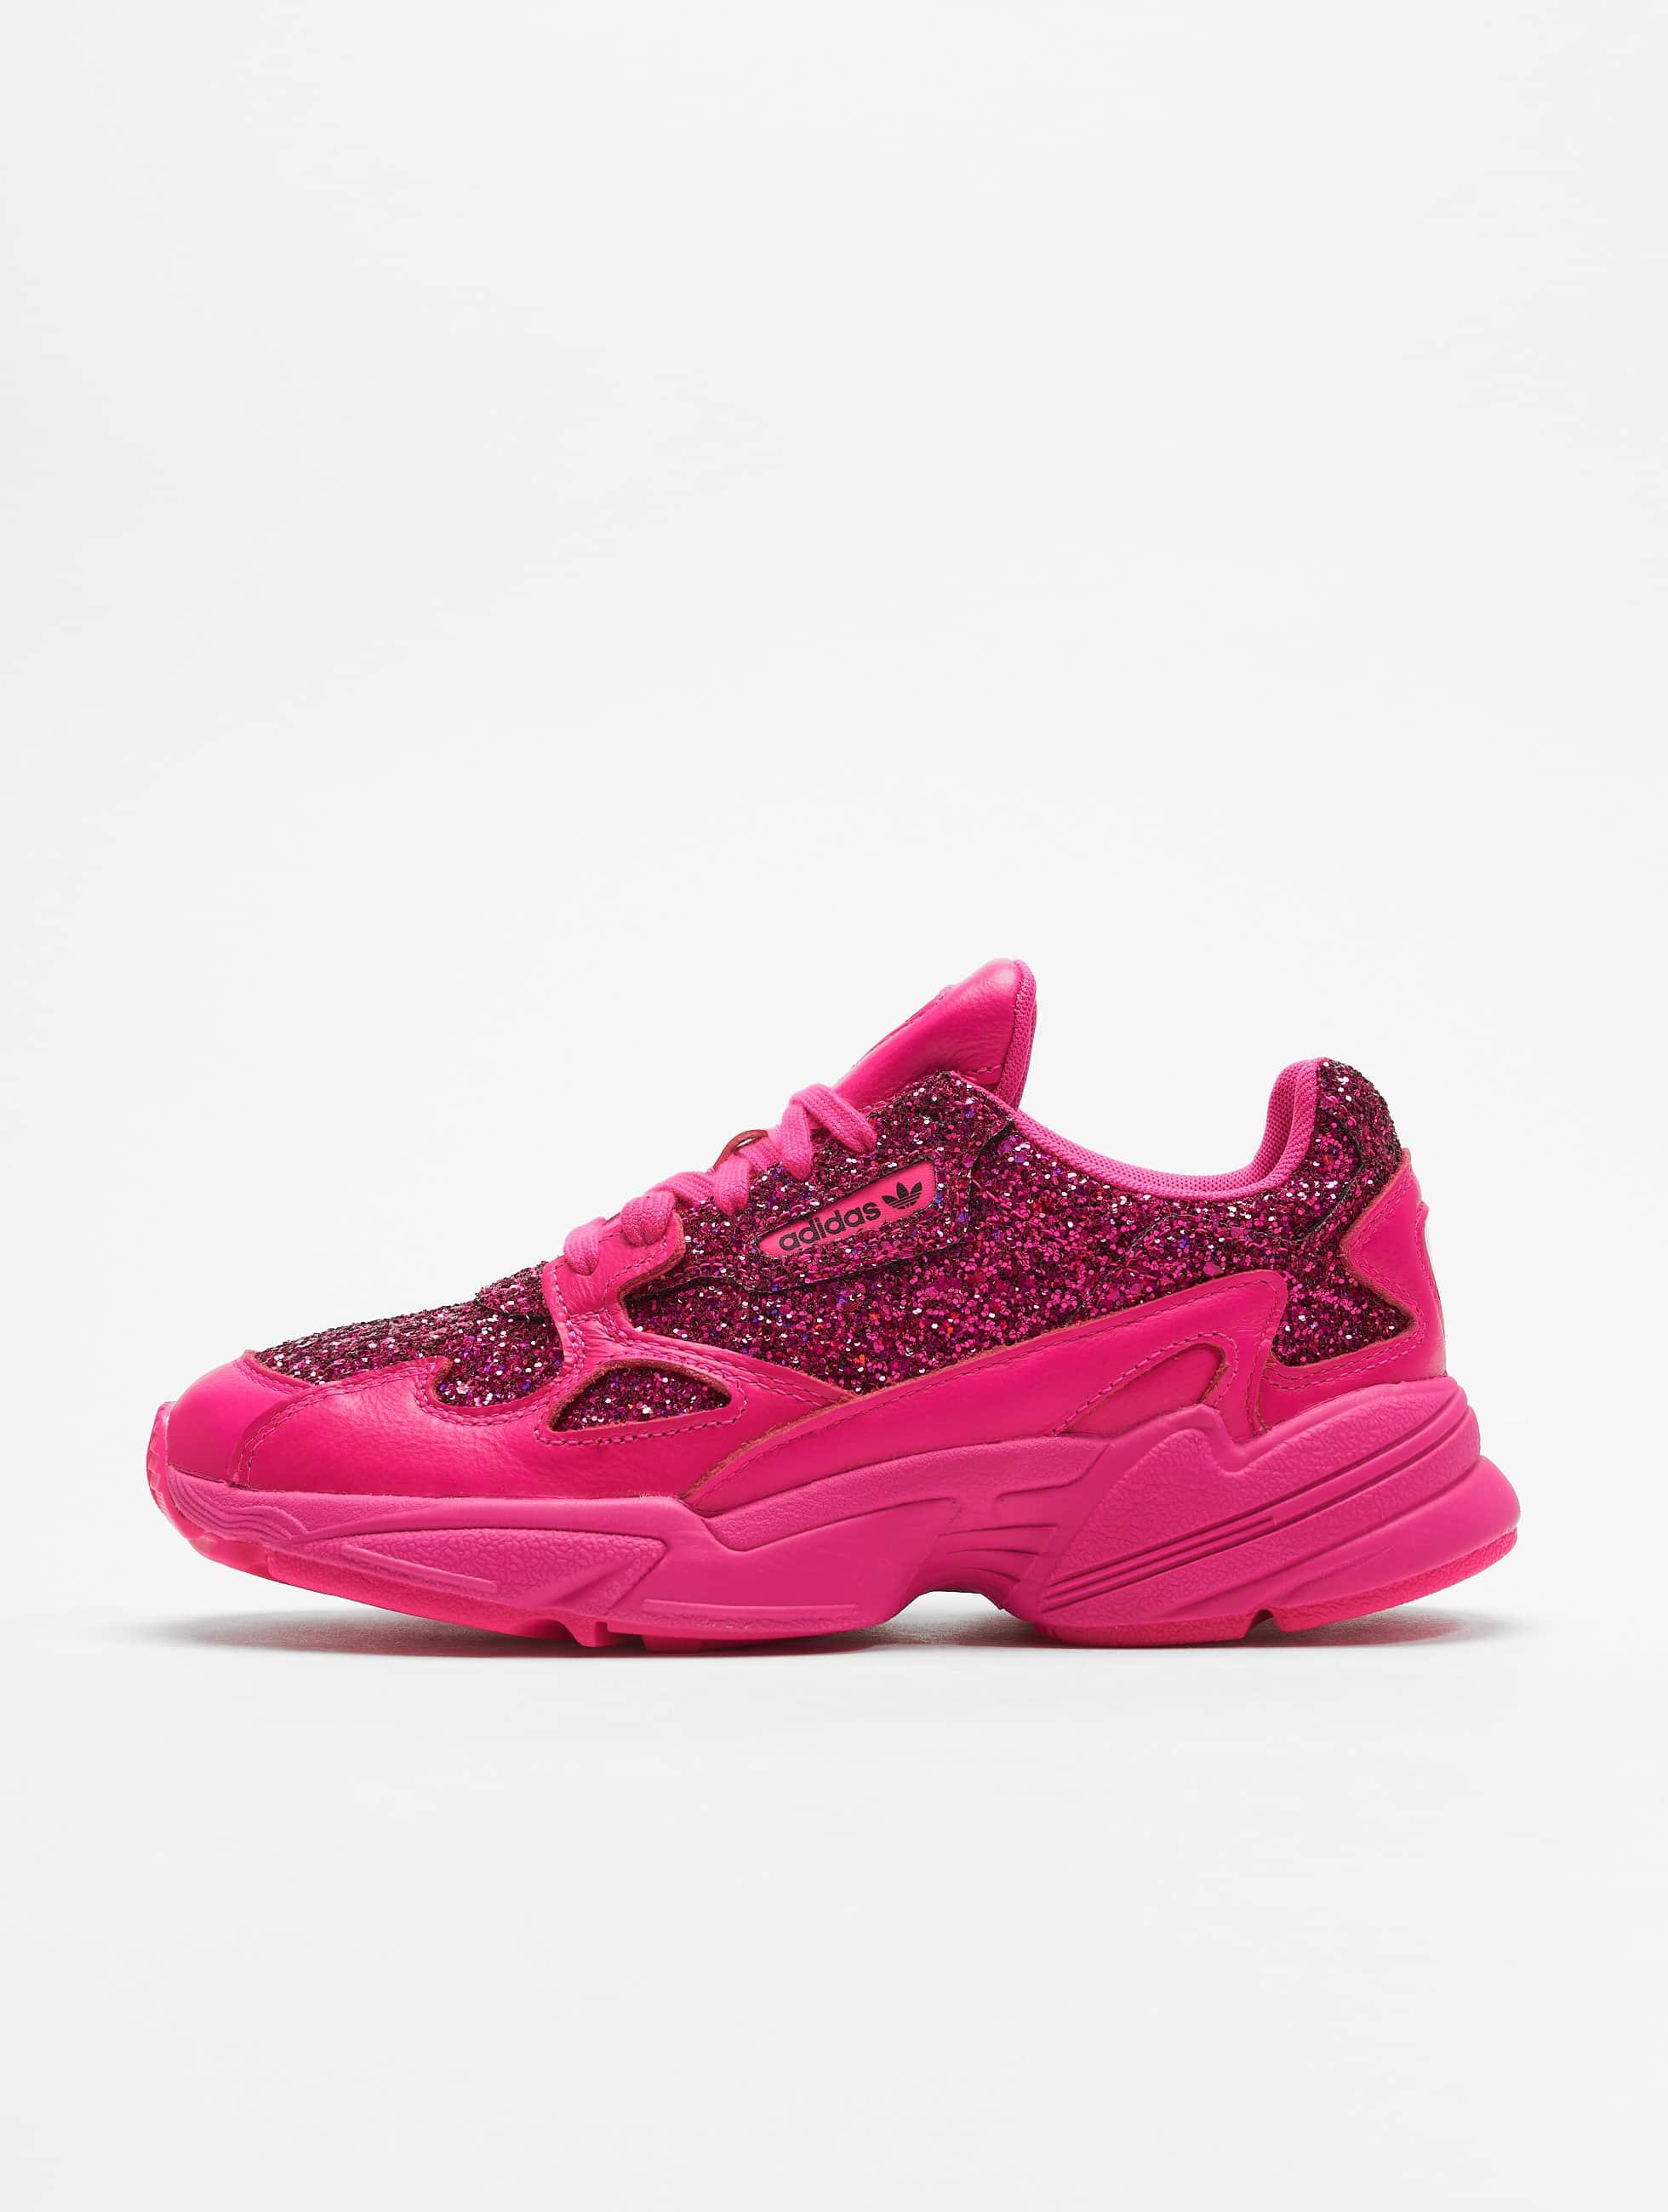 2b897c4d796c99 adidas originals Damen Sneaker Falcon in pink 599525